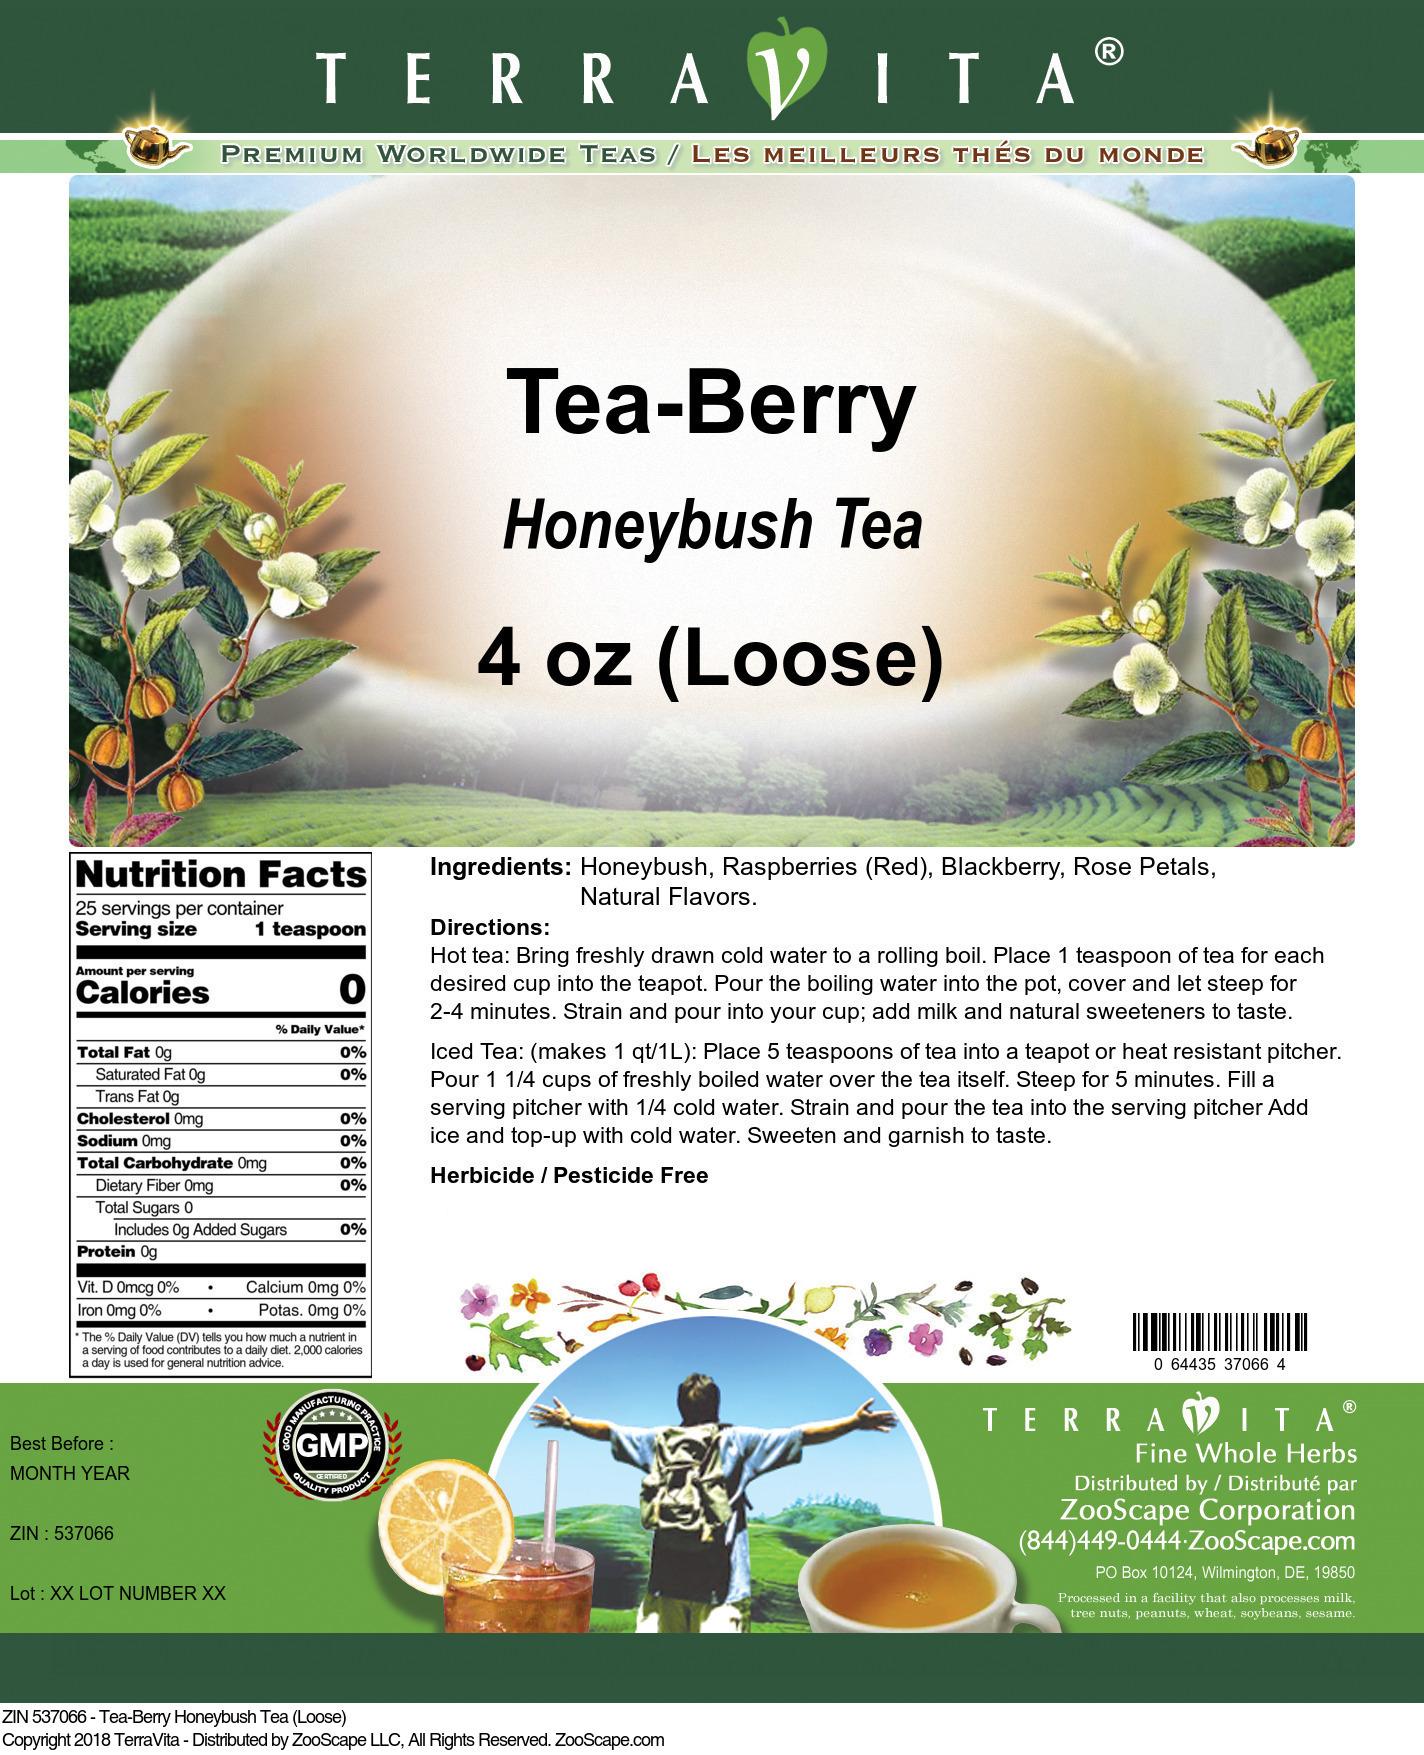 Tea-Berry Honeybush Tea (Loose)